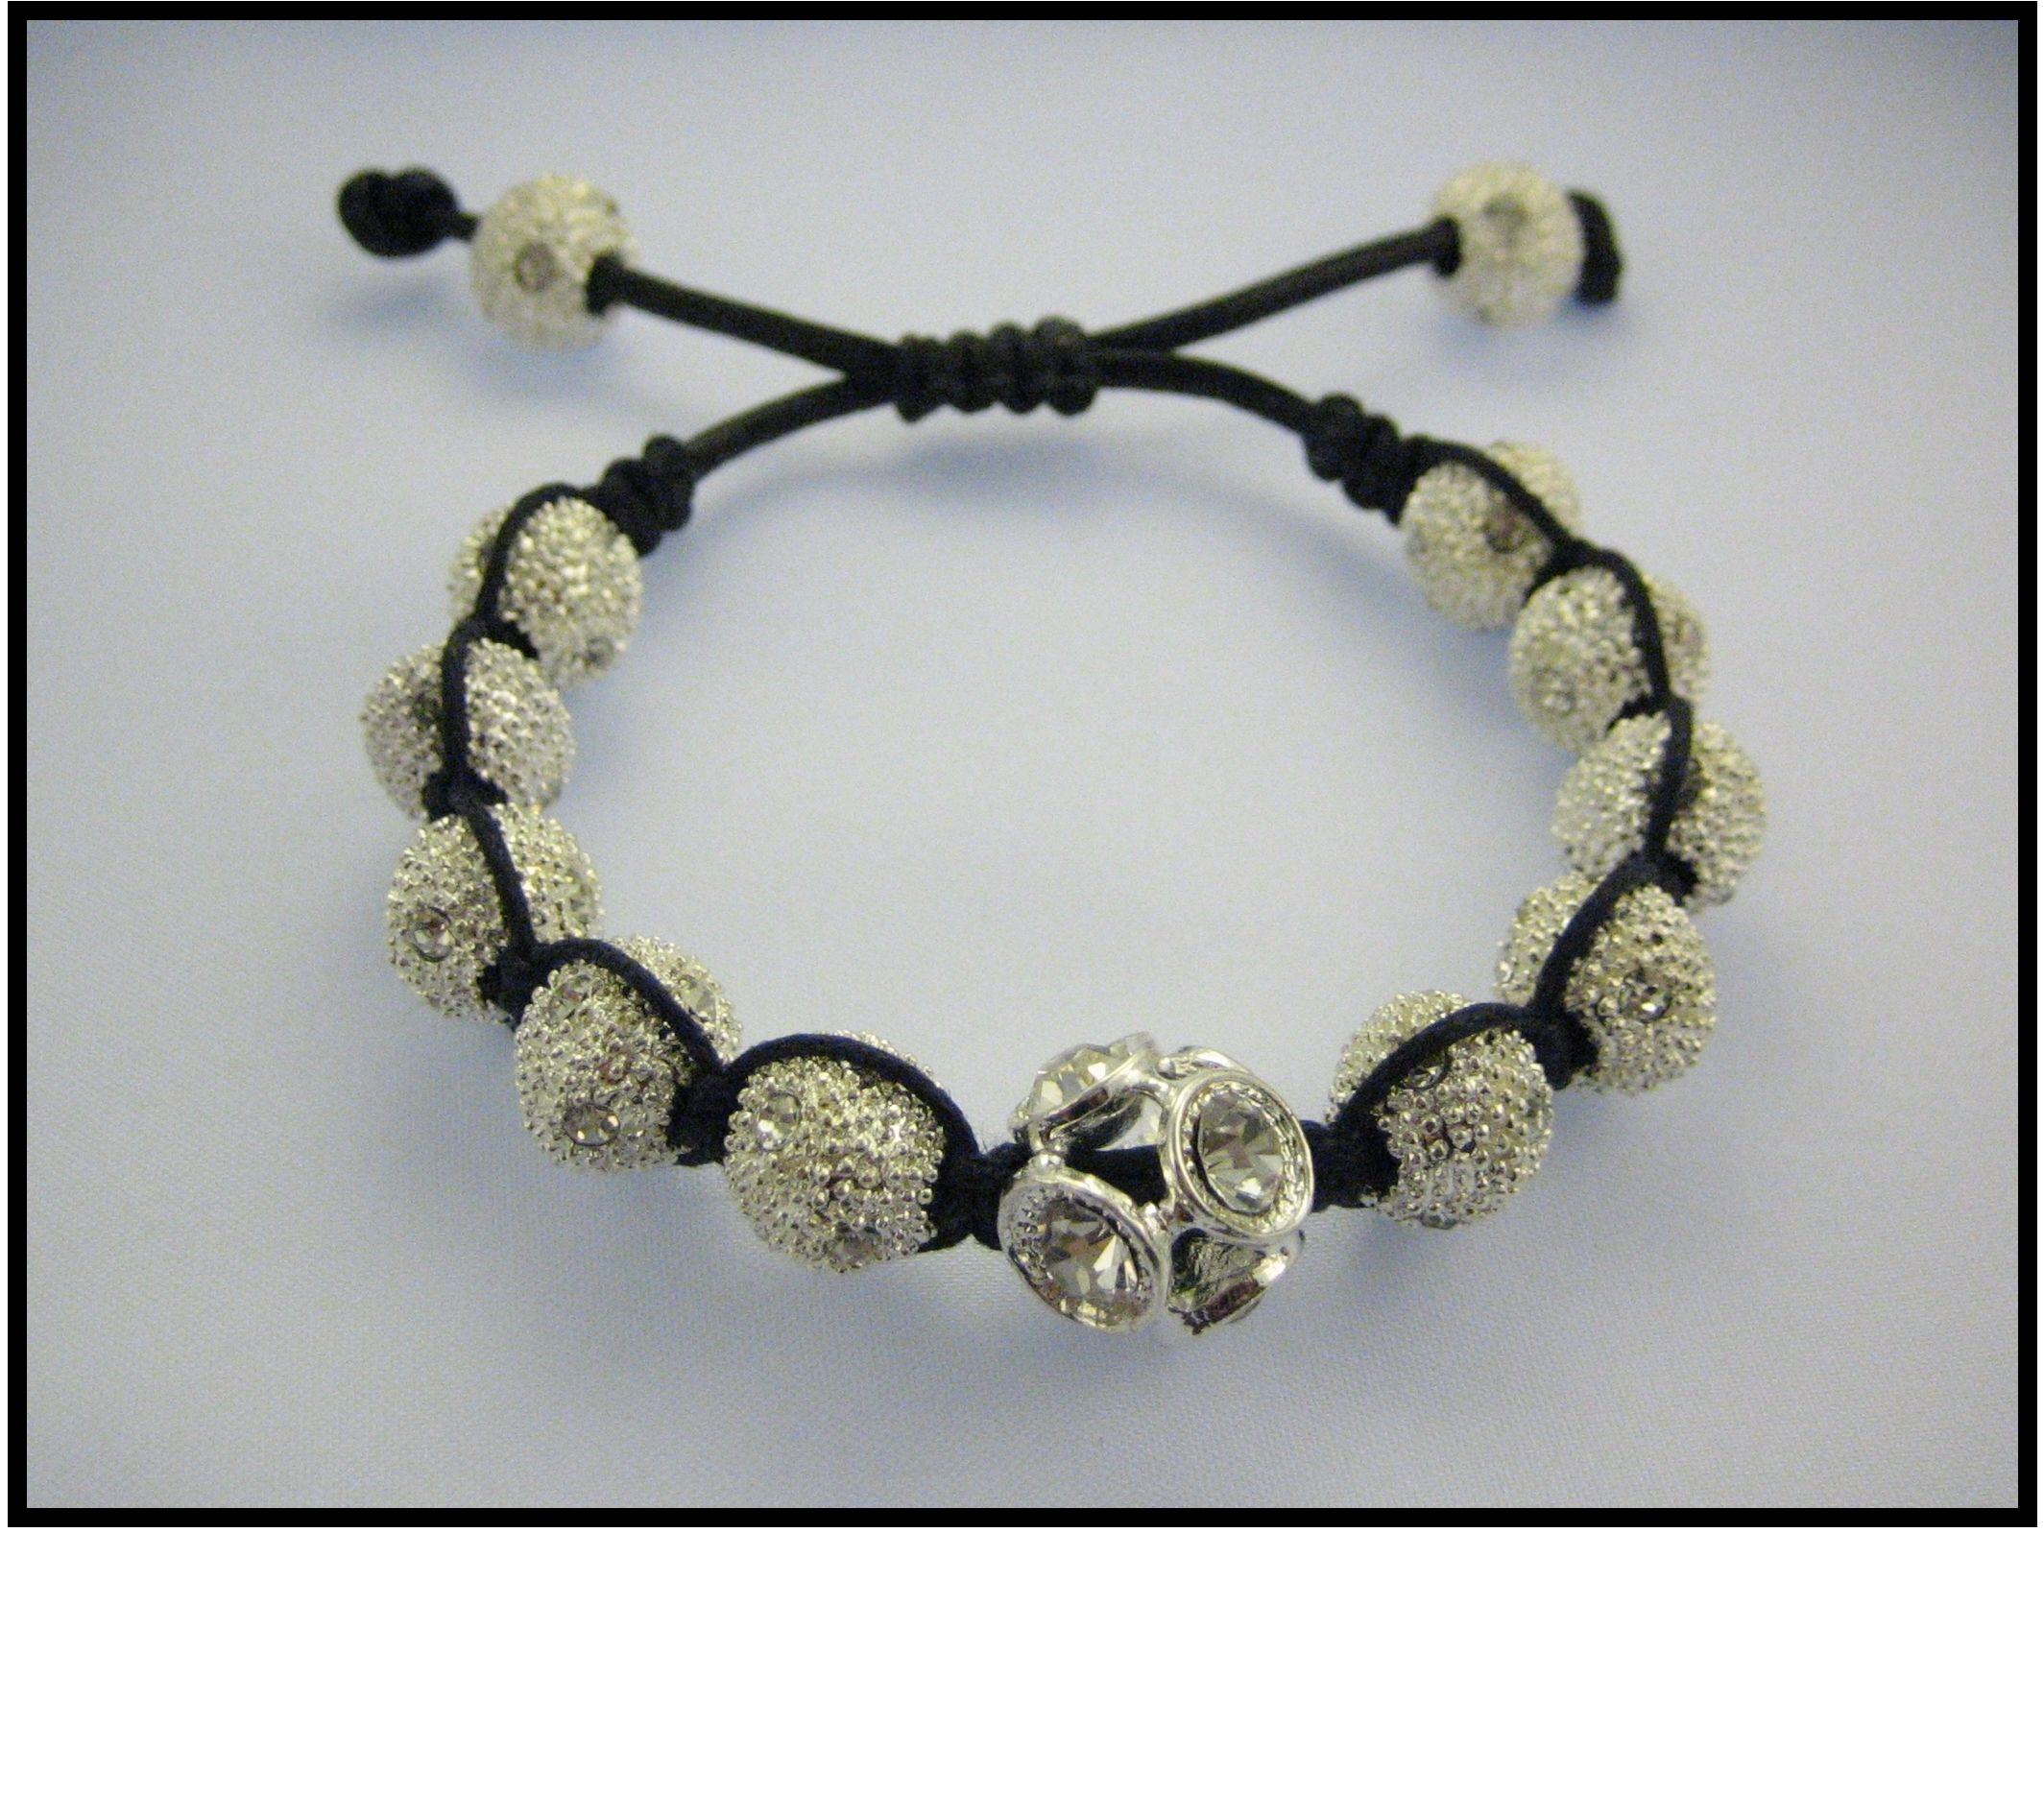 Shamballa bracelet swarovski crystal beads hip hop style design